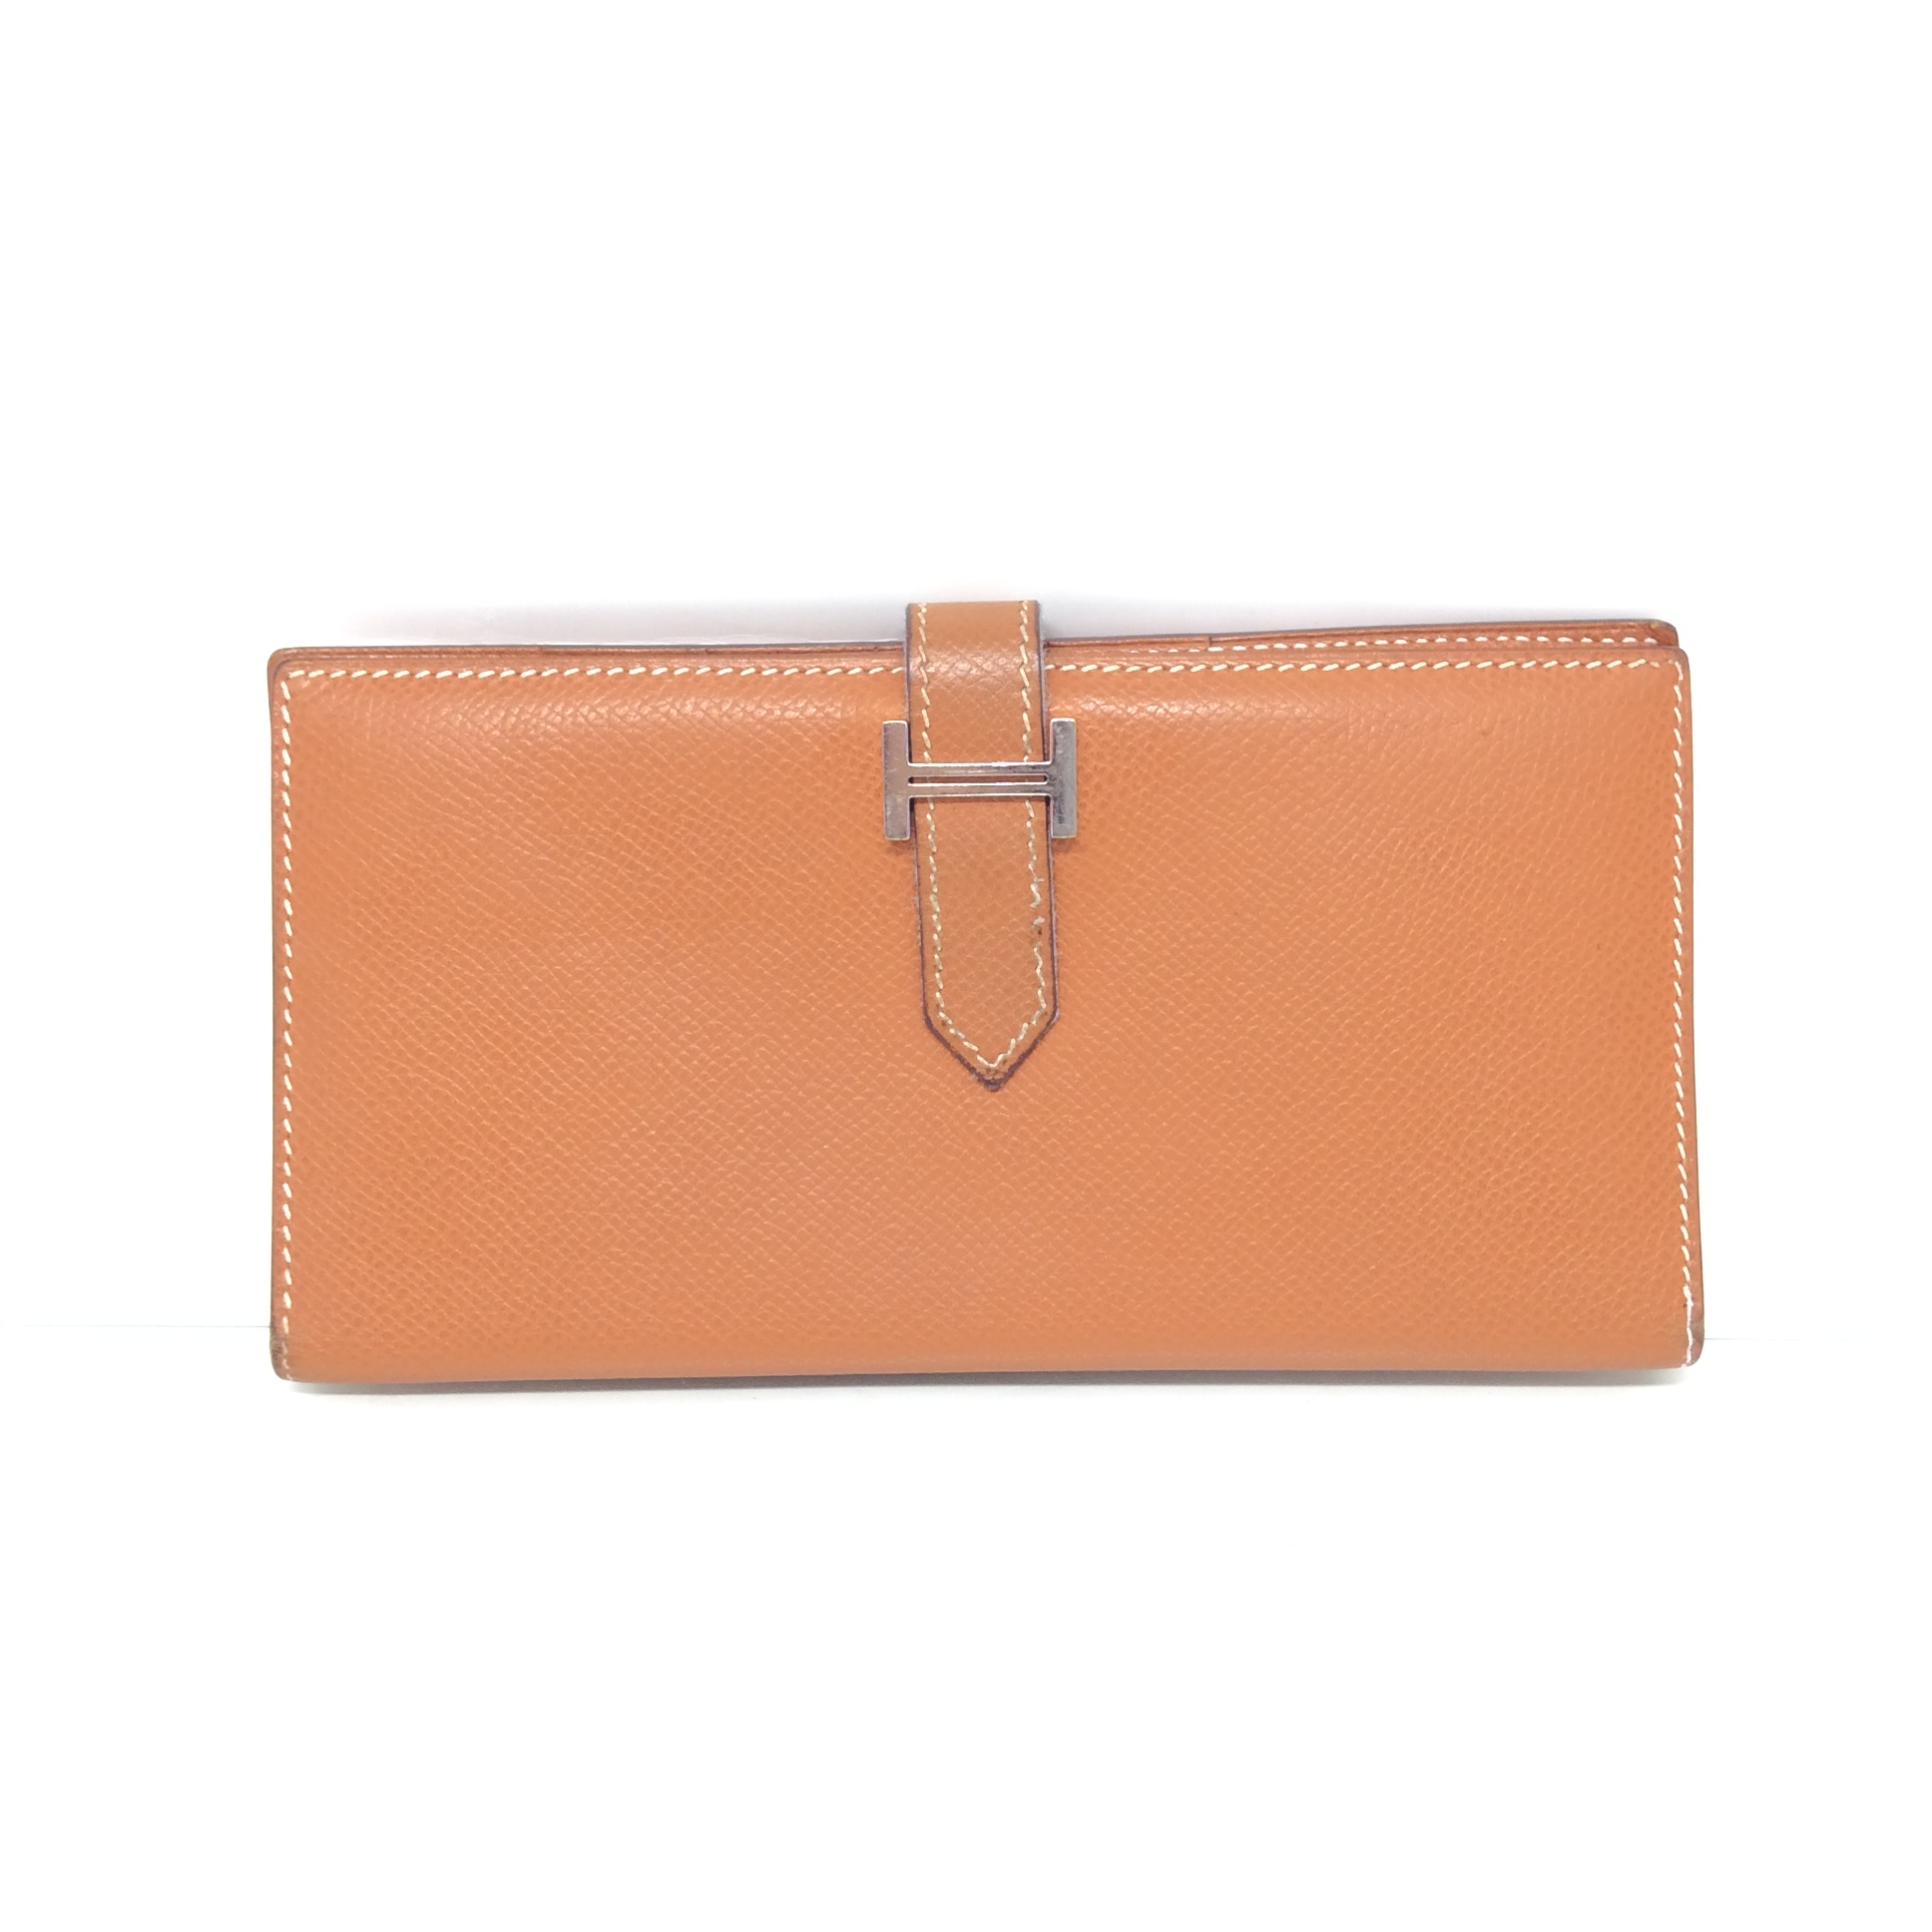 (SOLDOUT)HERMES epsom leather gold bearn wallet